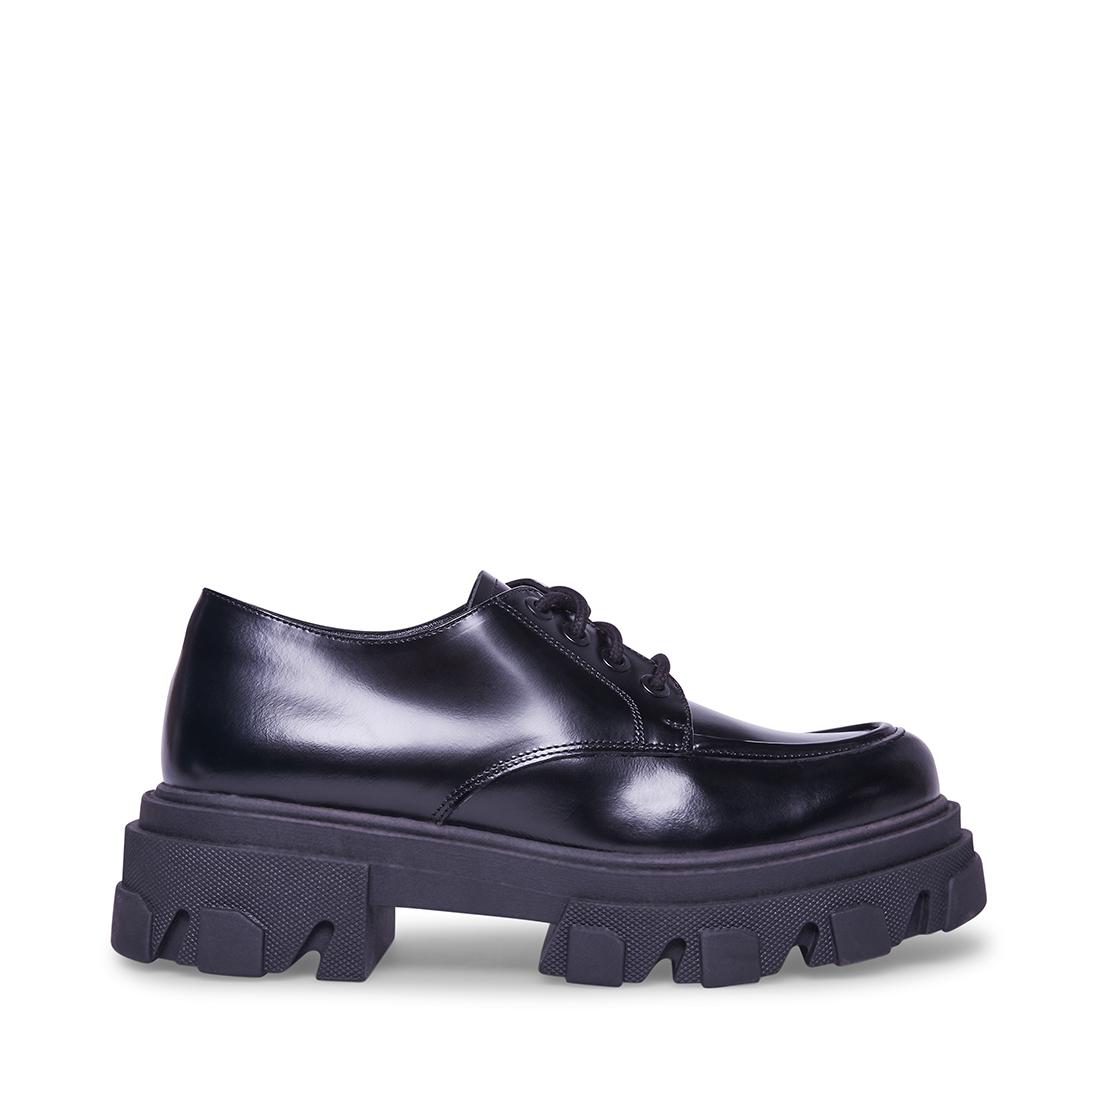 Steve Madden Casual Helga Shoe